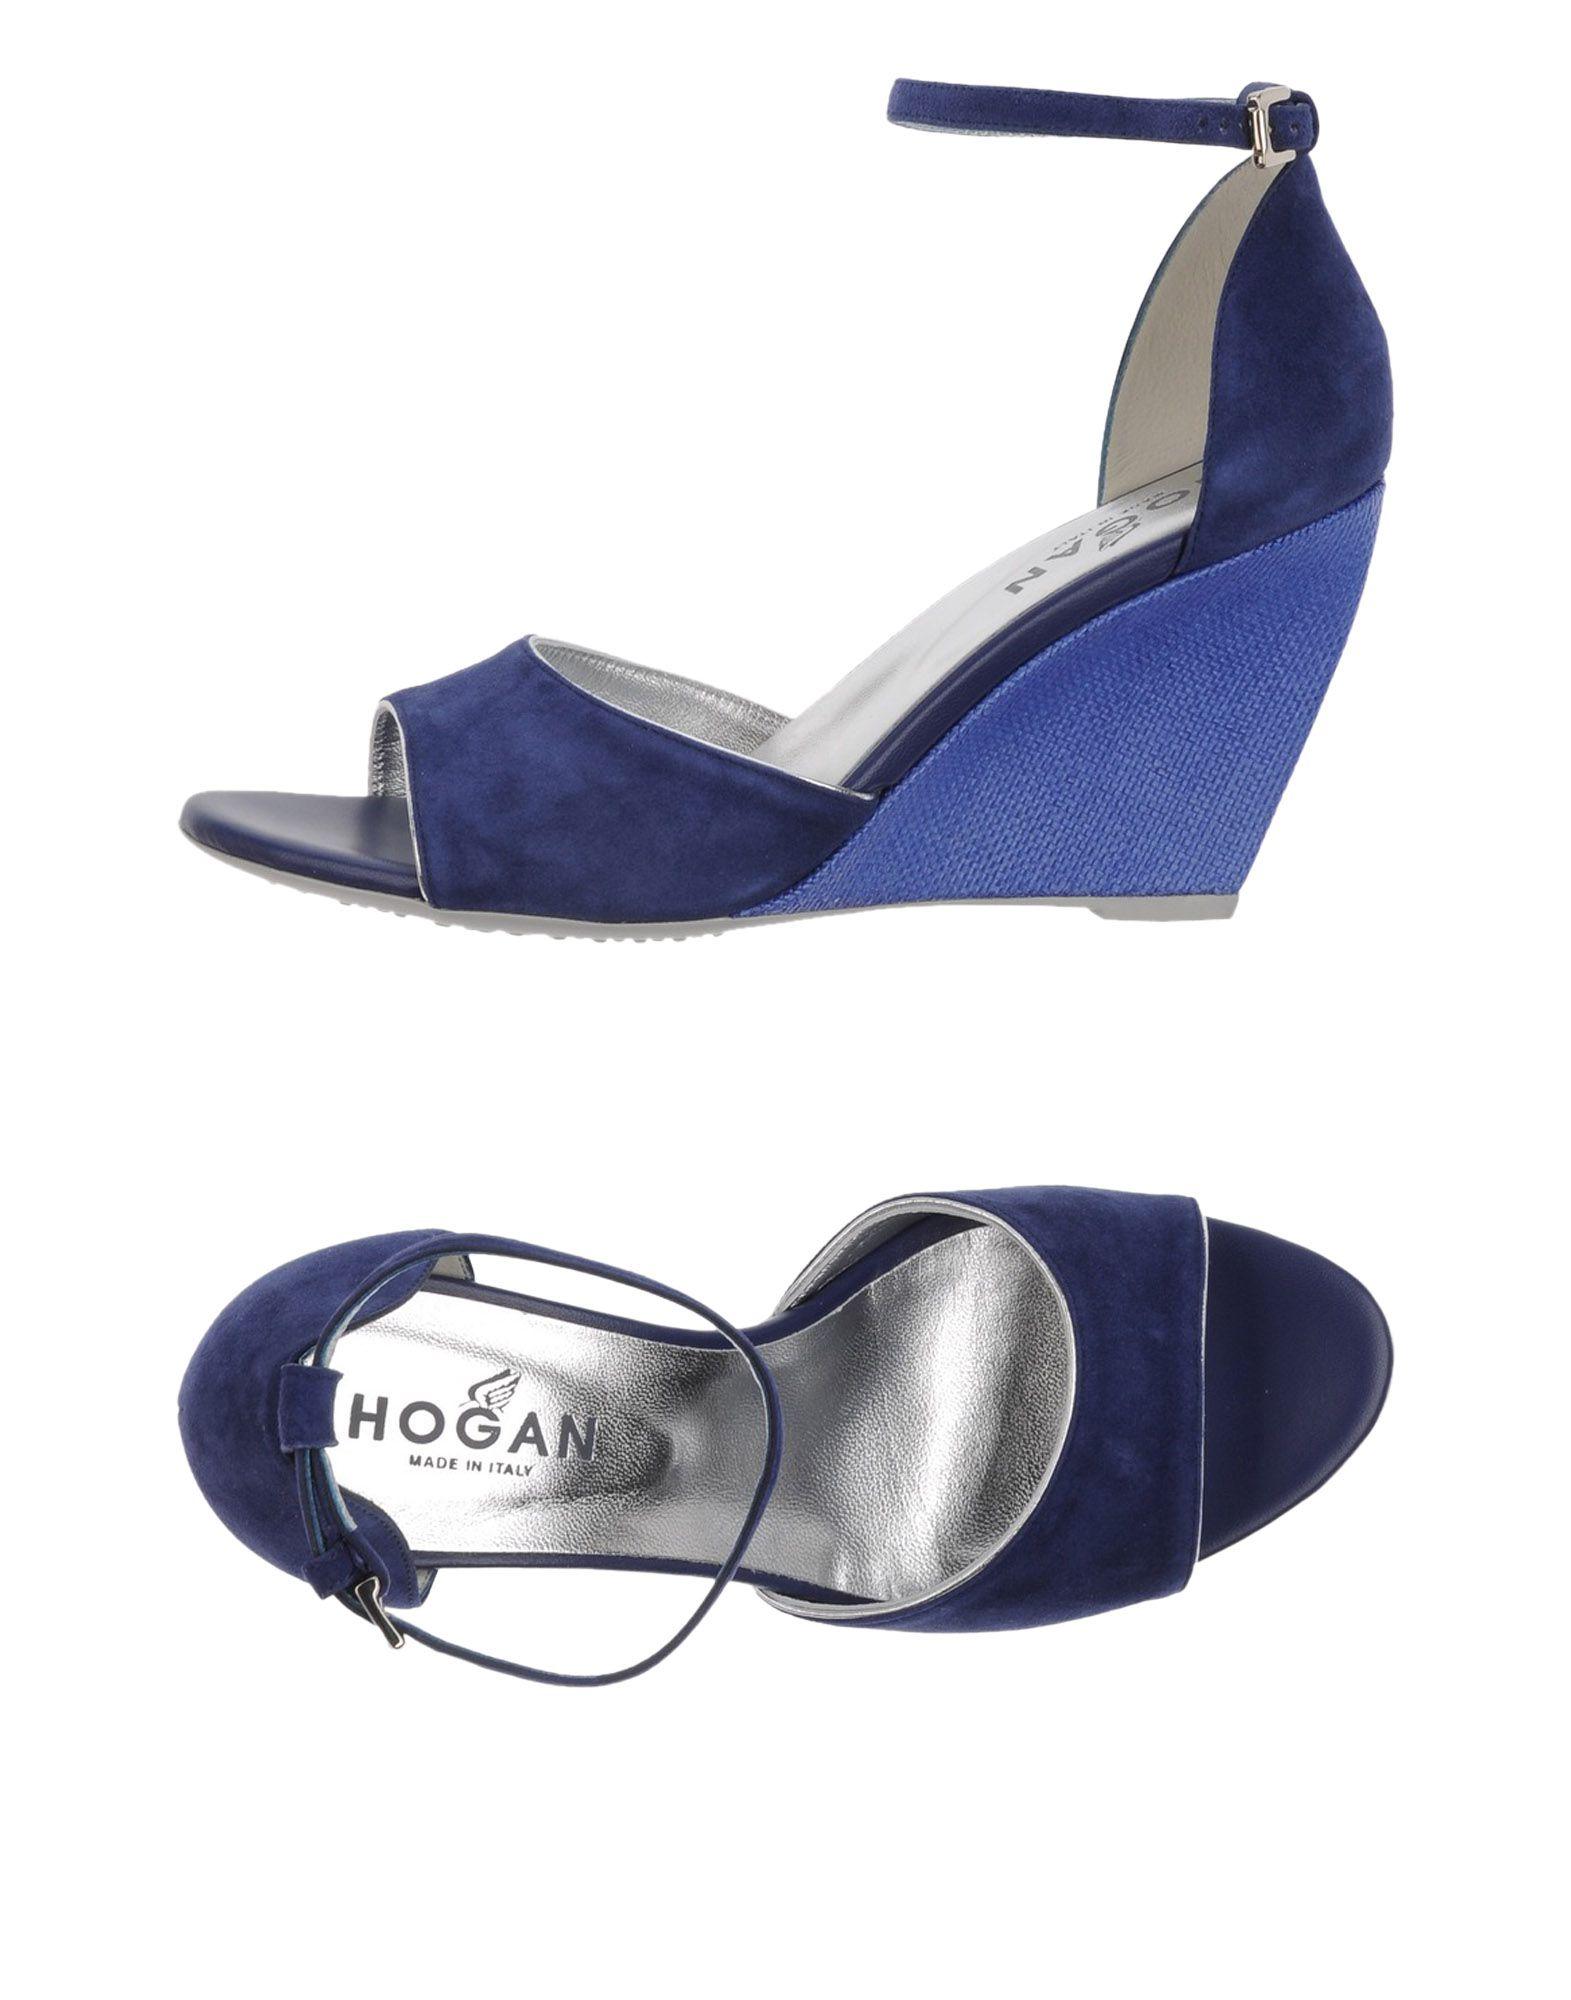 Moda 11219522LS Sandali Hogan Donna - 11219522LS Moda ec4219